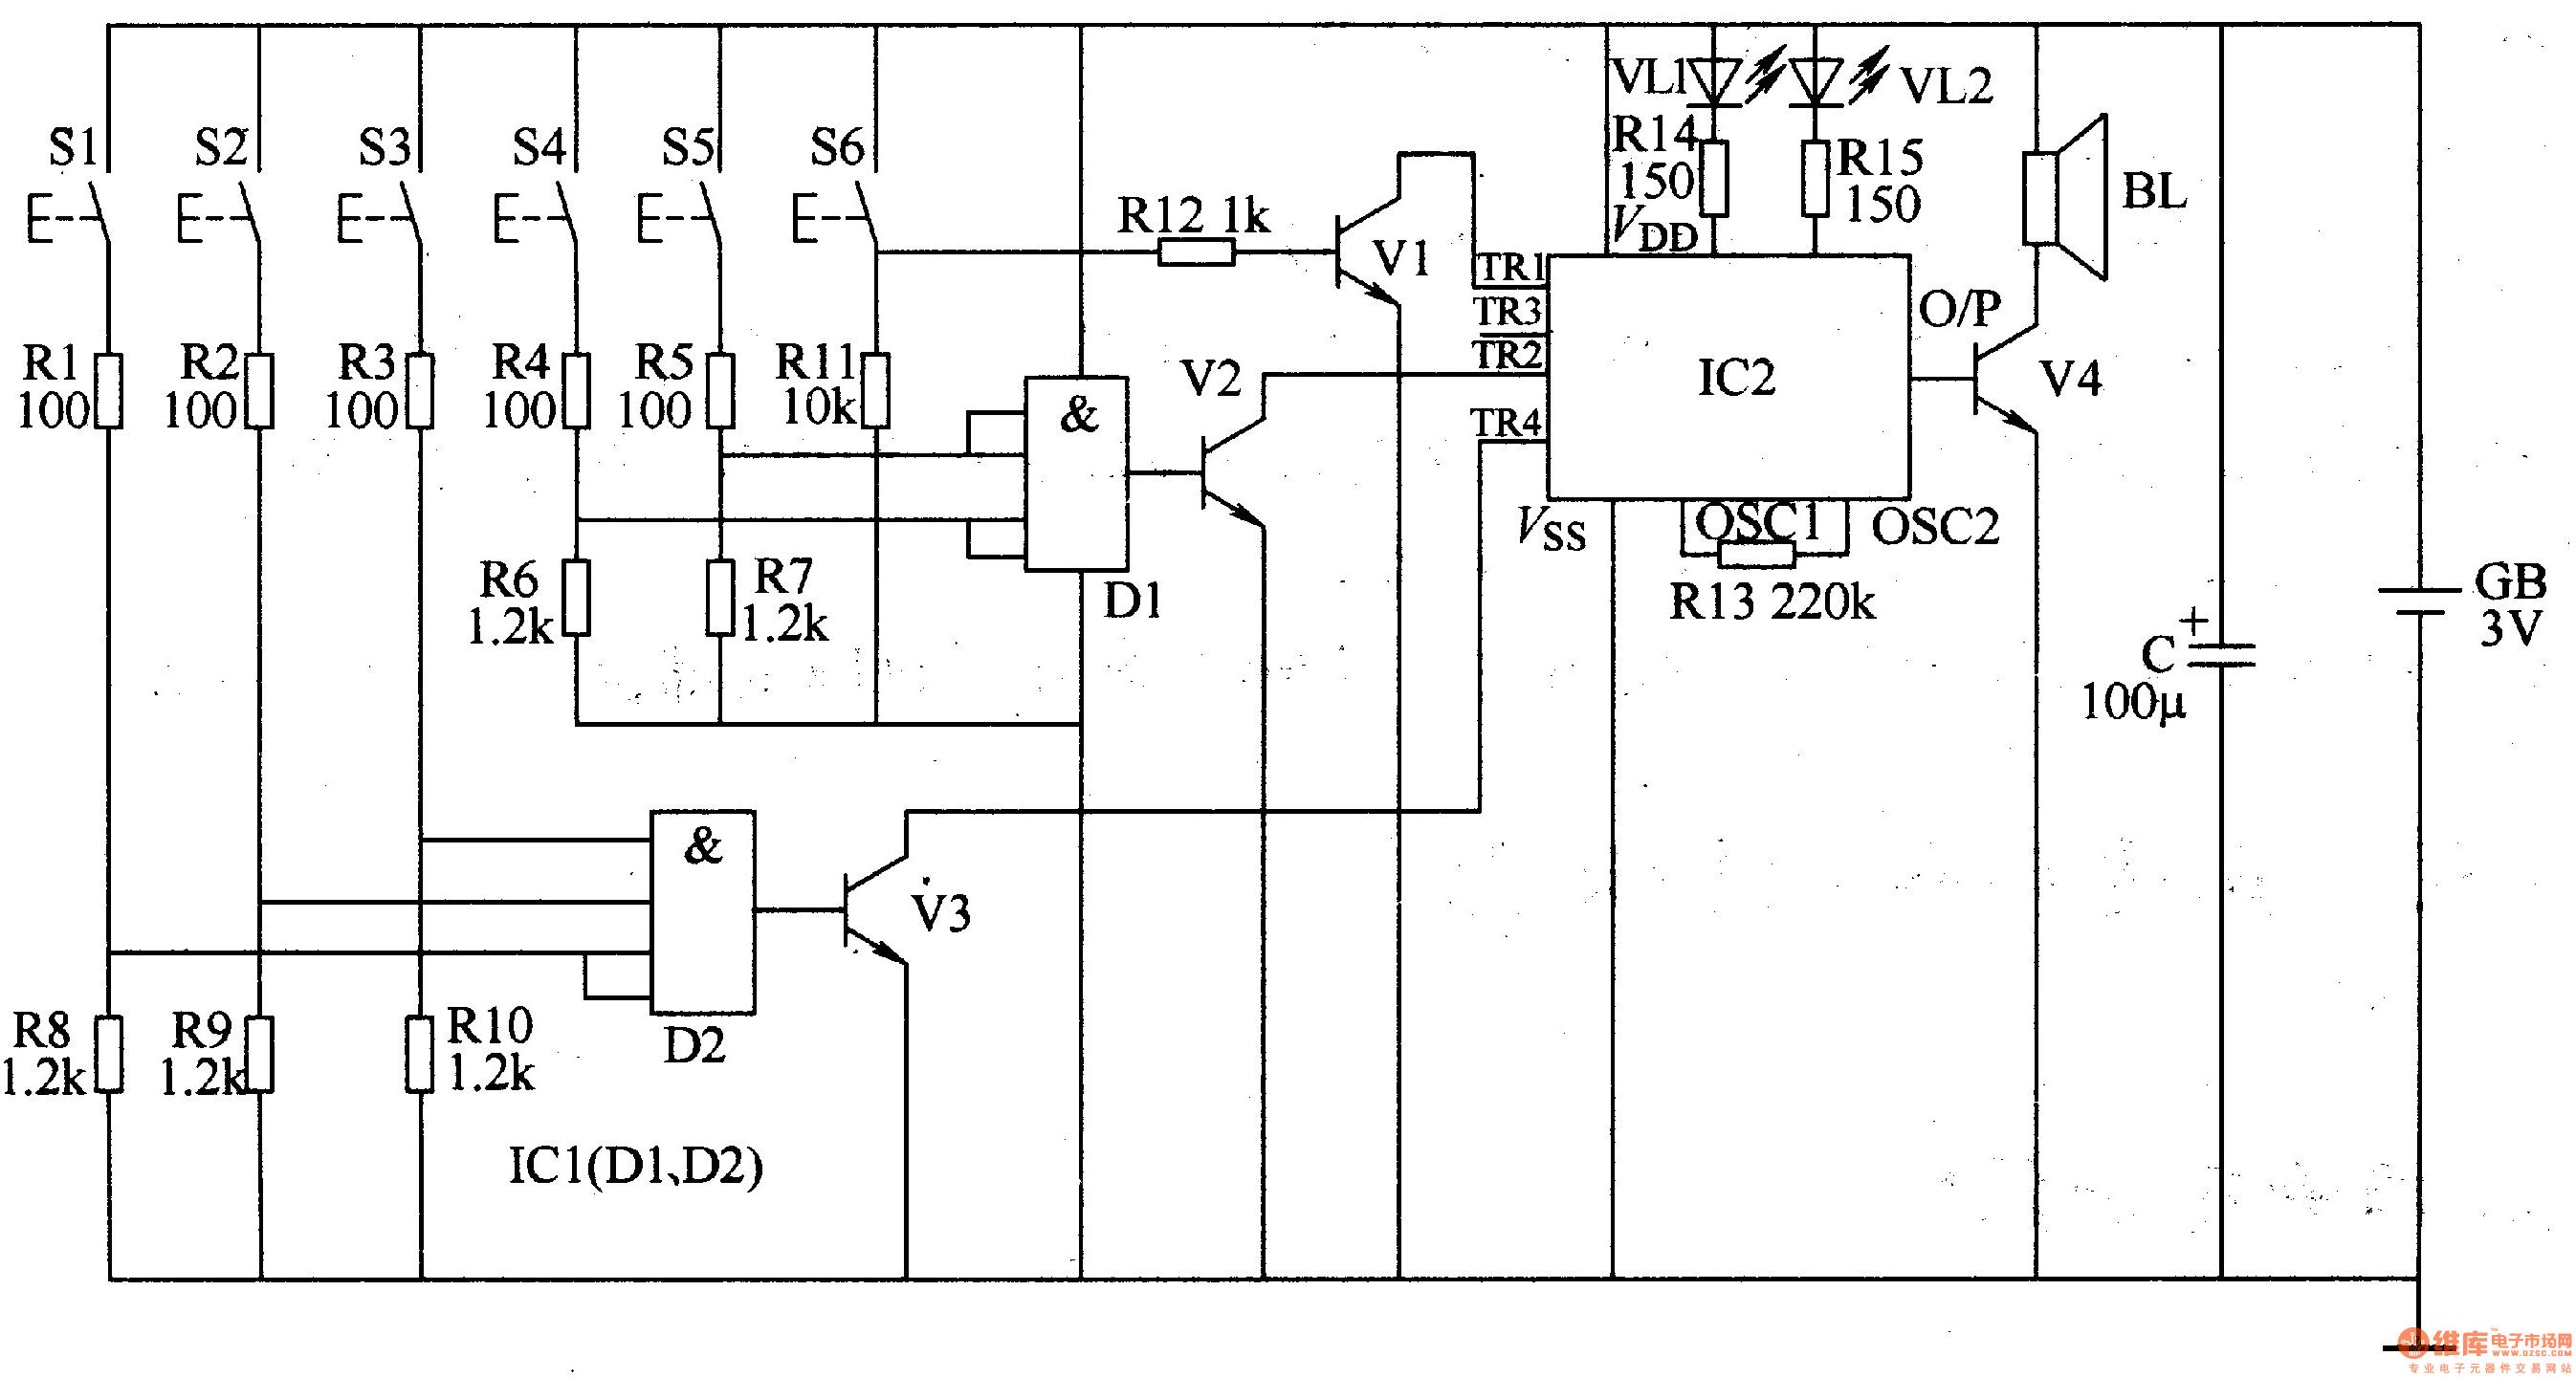 Three Tone Electronic Doorbell 2 Electrical Equipment Circuit 0124vat1a Powersupplycircuit Diagram Seekiccom